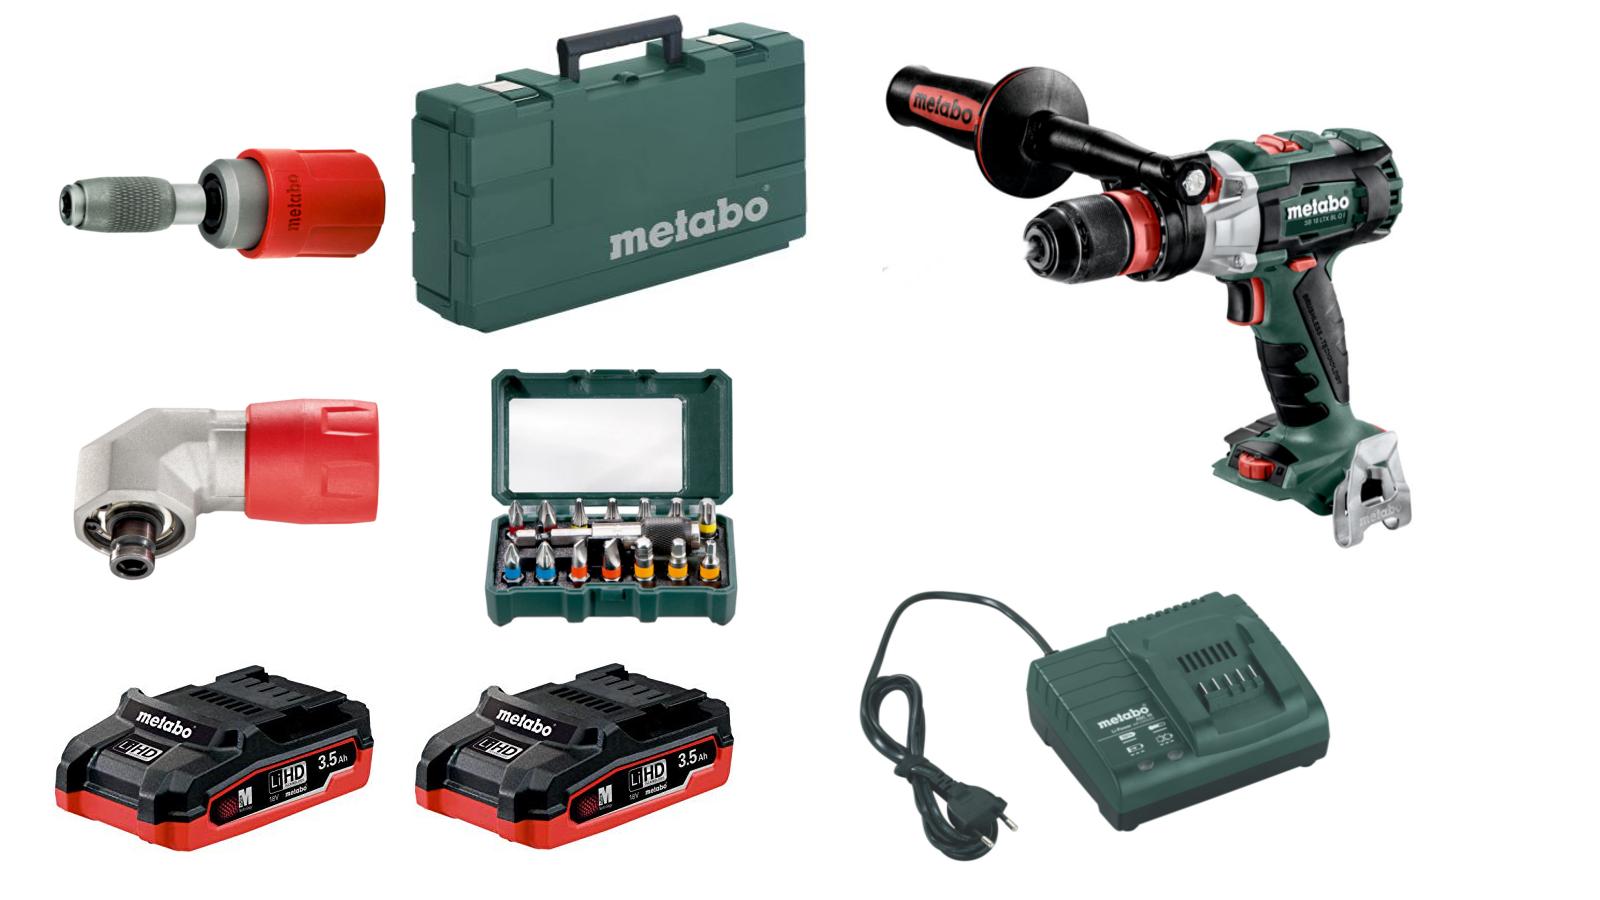 Metabo SB 18 LTX BL Q I Akku-Schlagbohrer Set 2x 3,5 LiHD + SC 60 Ladegerät  79